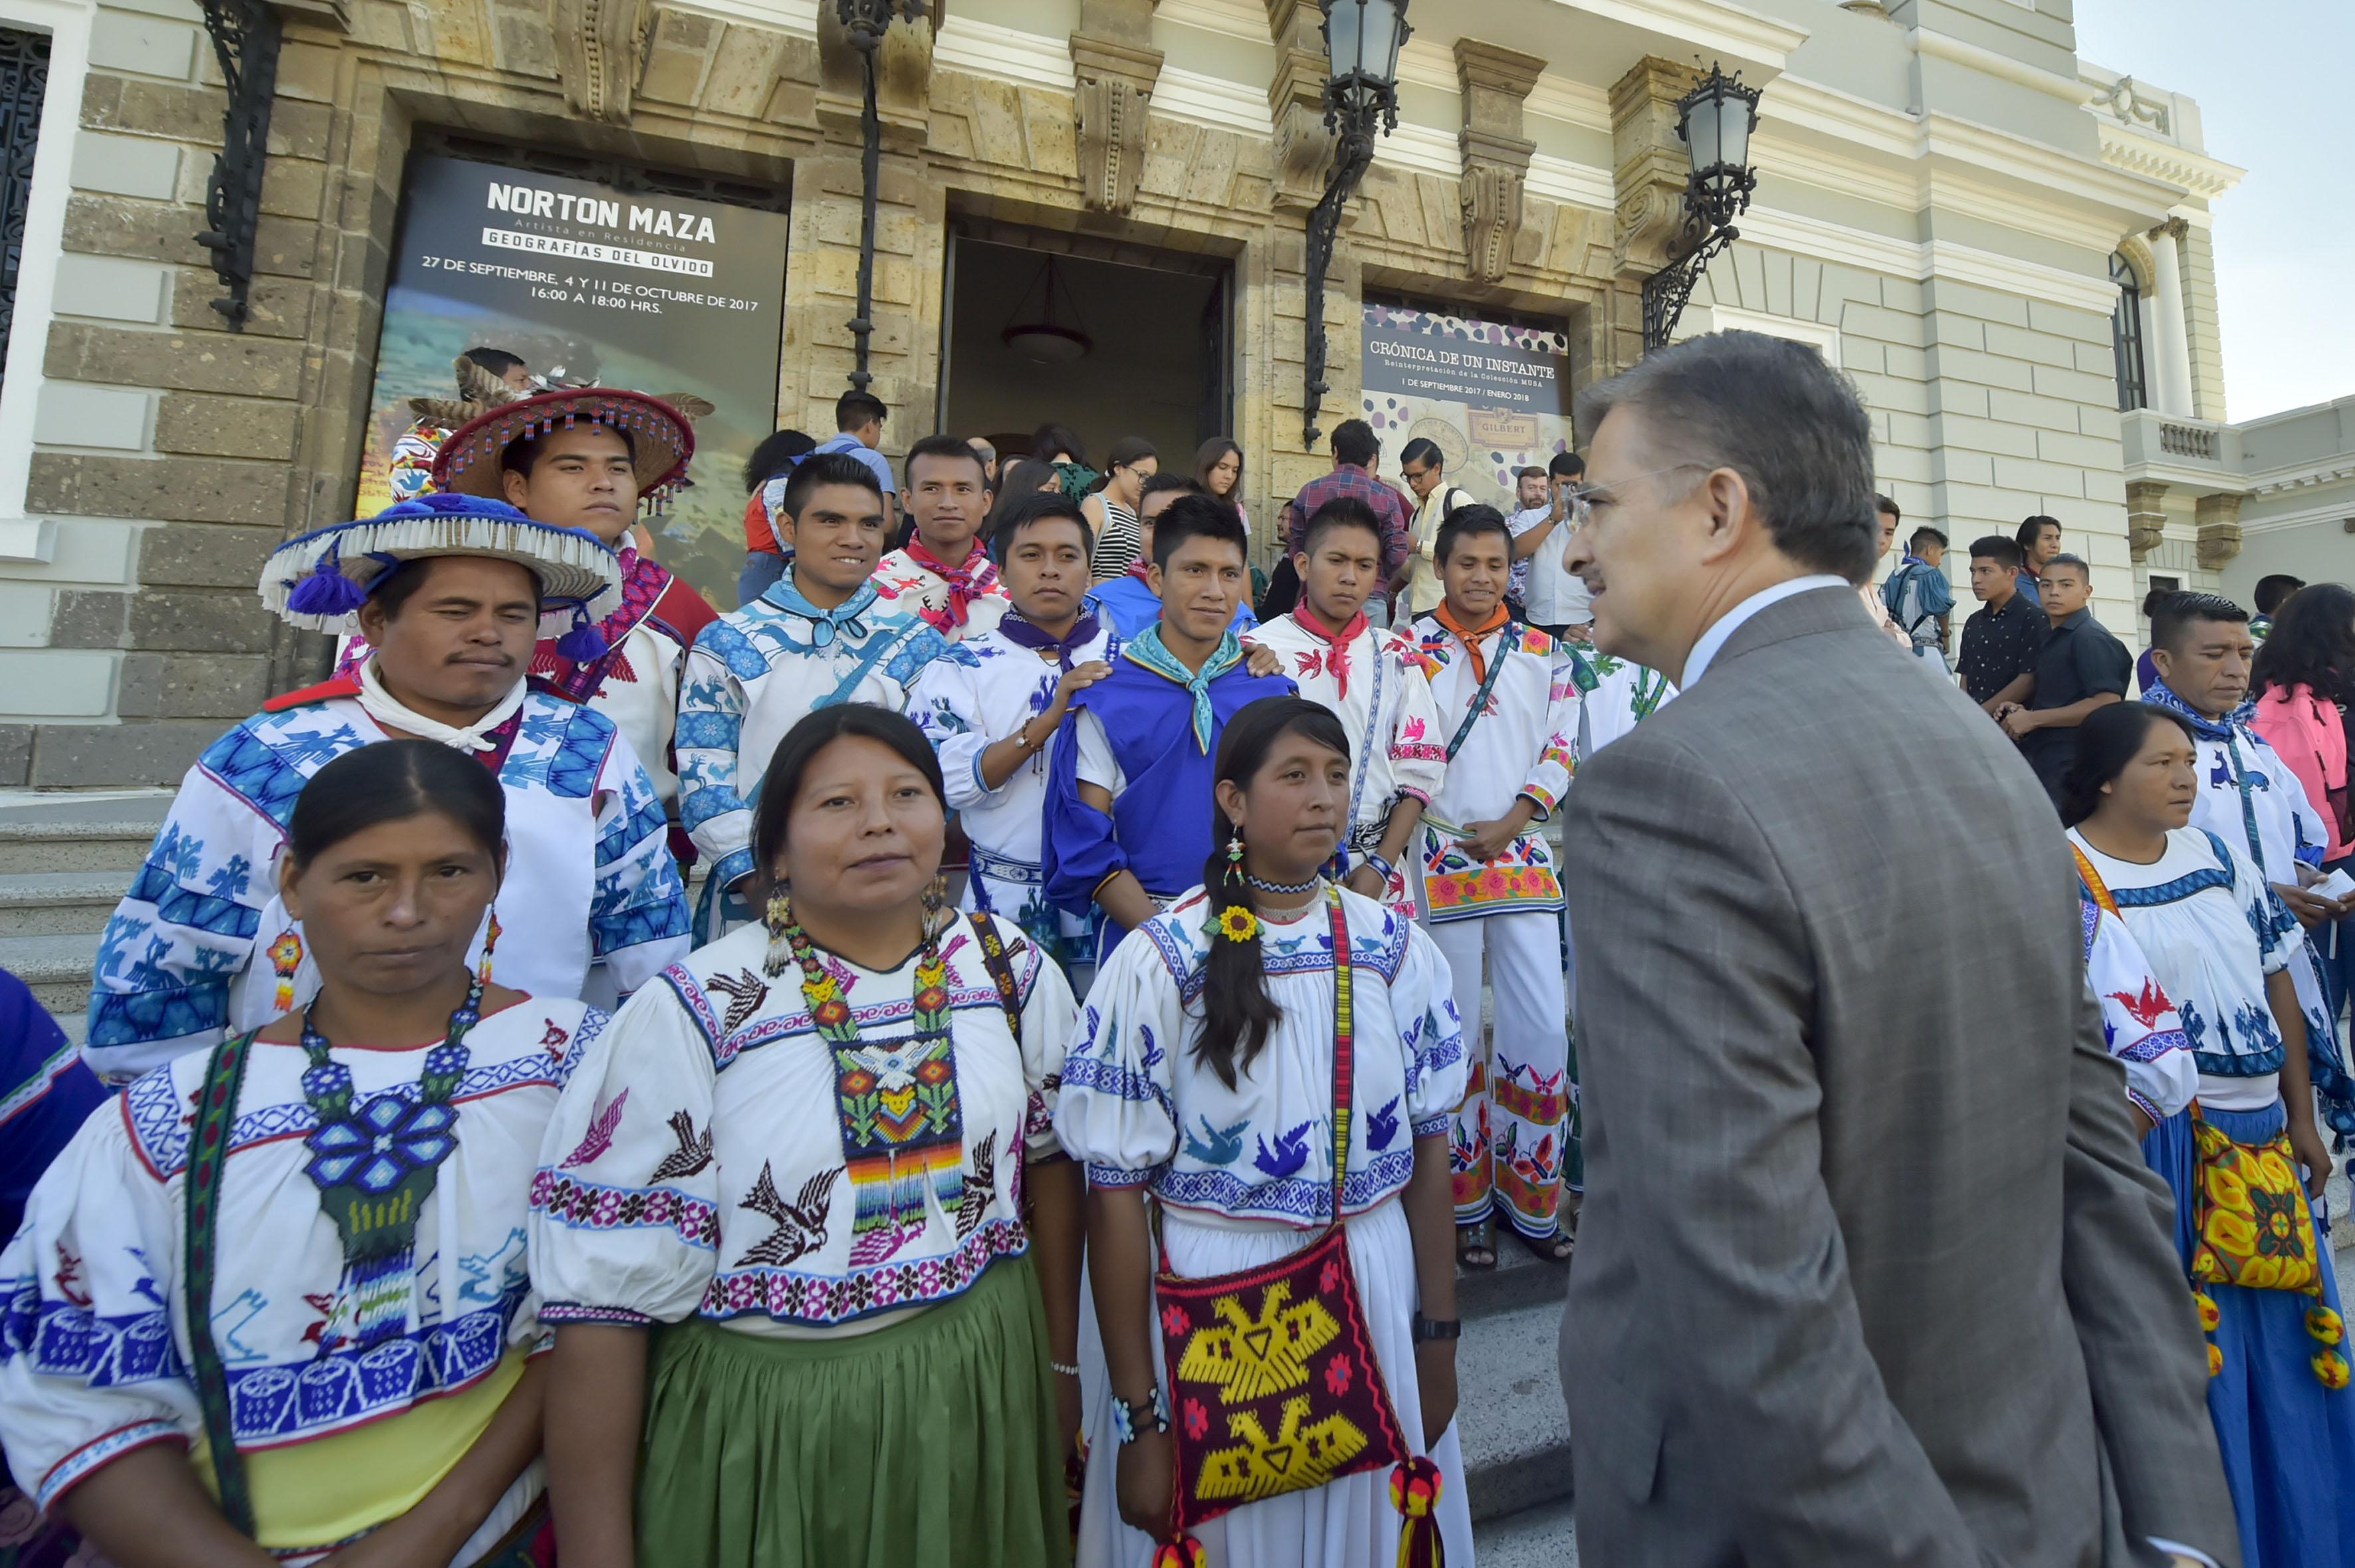 Rector General de la UdeG, maestro Itzcóatl Tonatiuh Bravo Padilla con representantes de comunidades Wixaritari